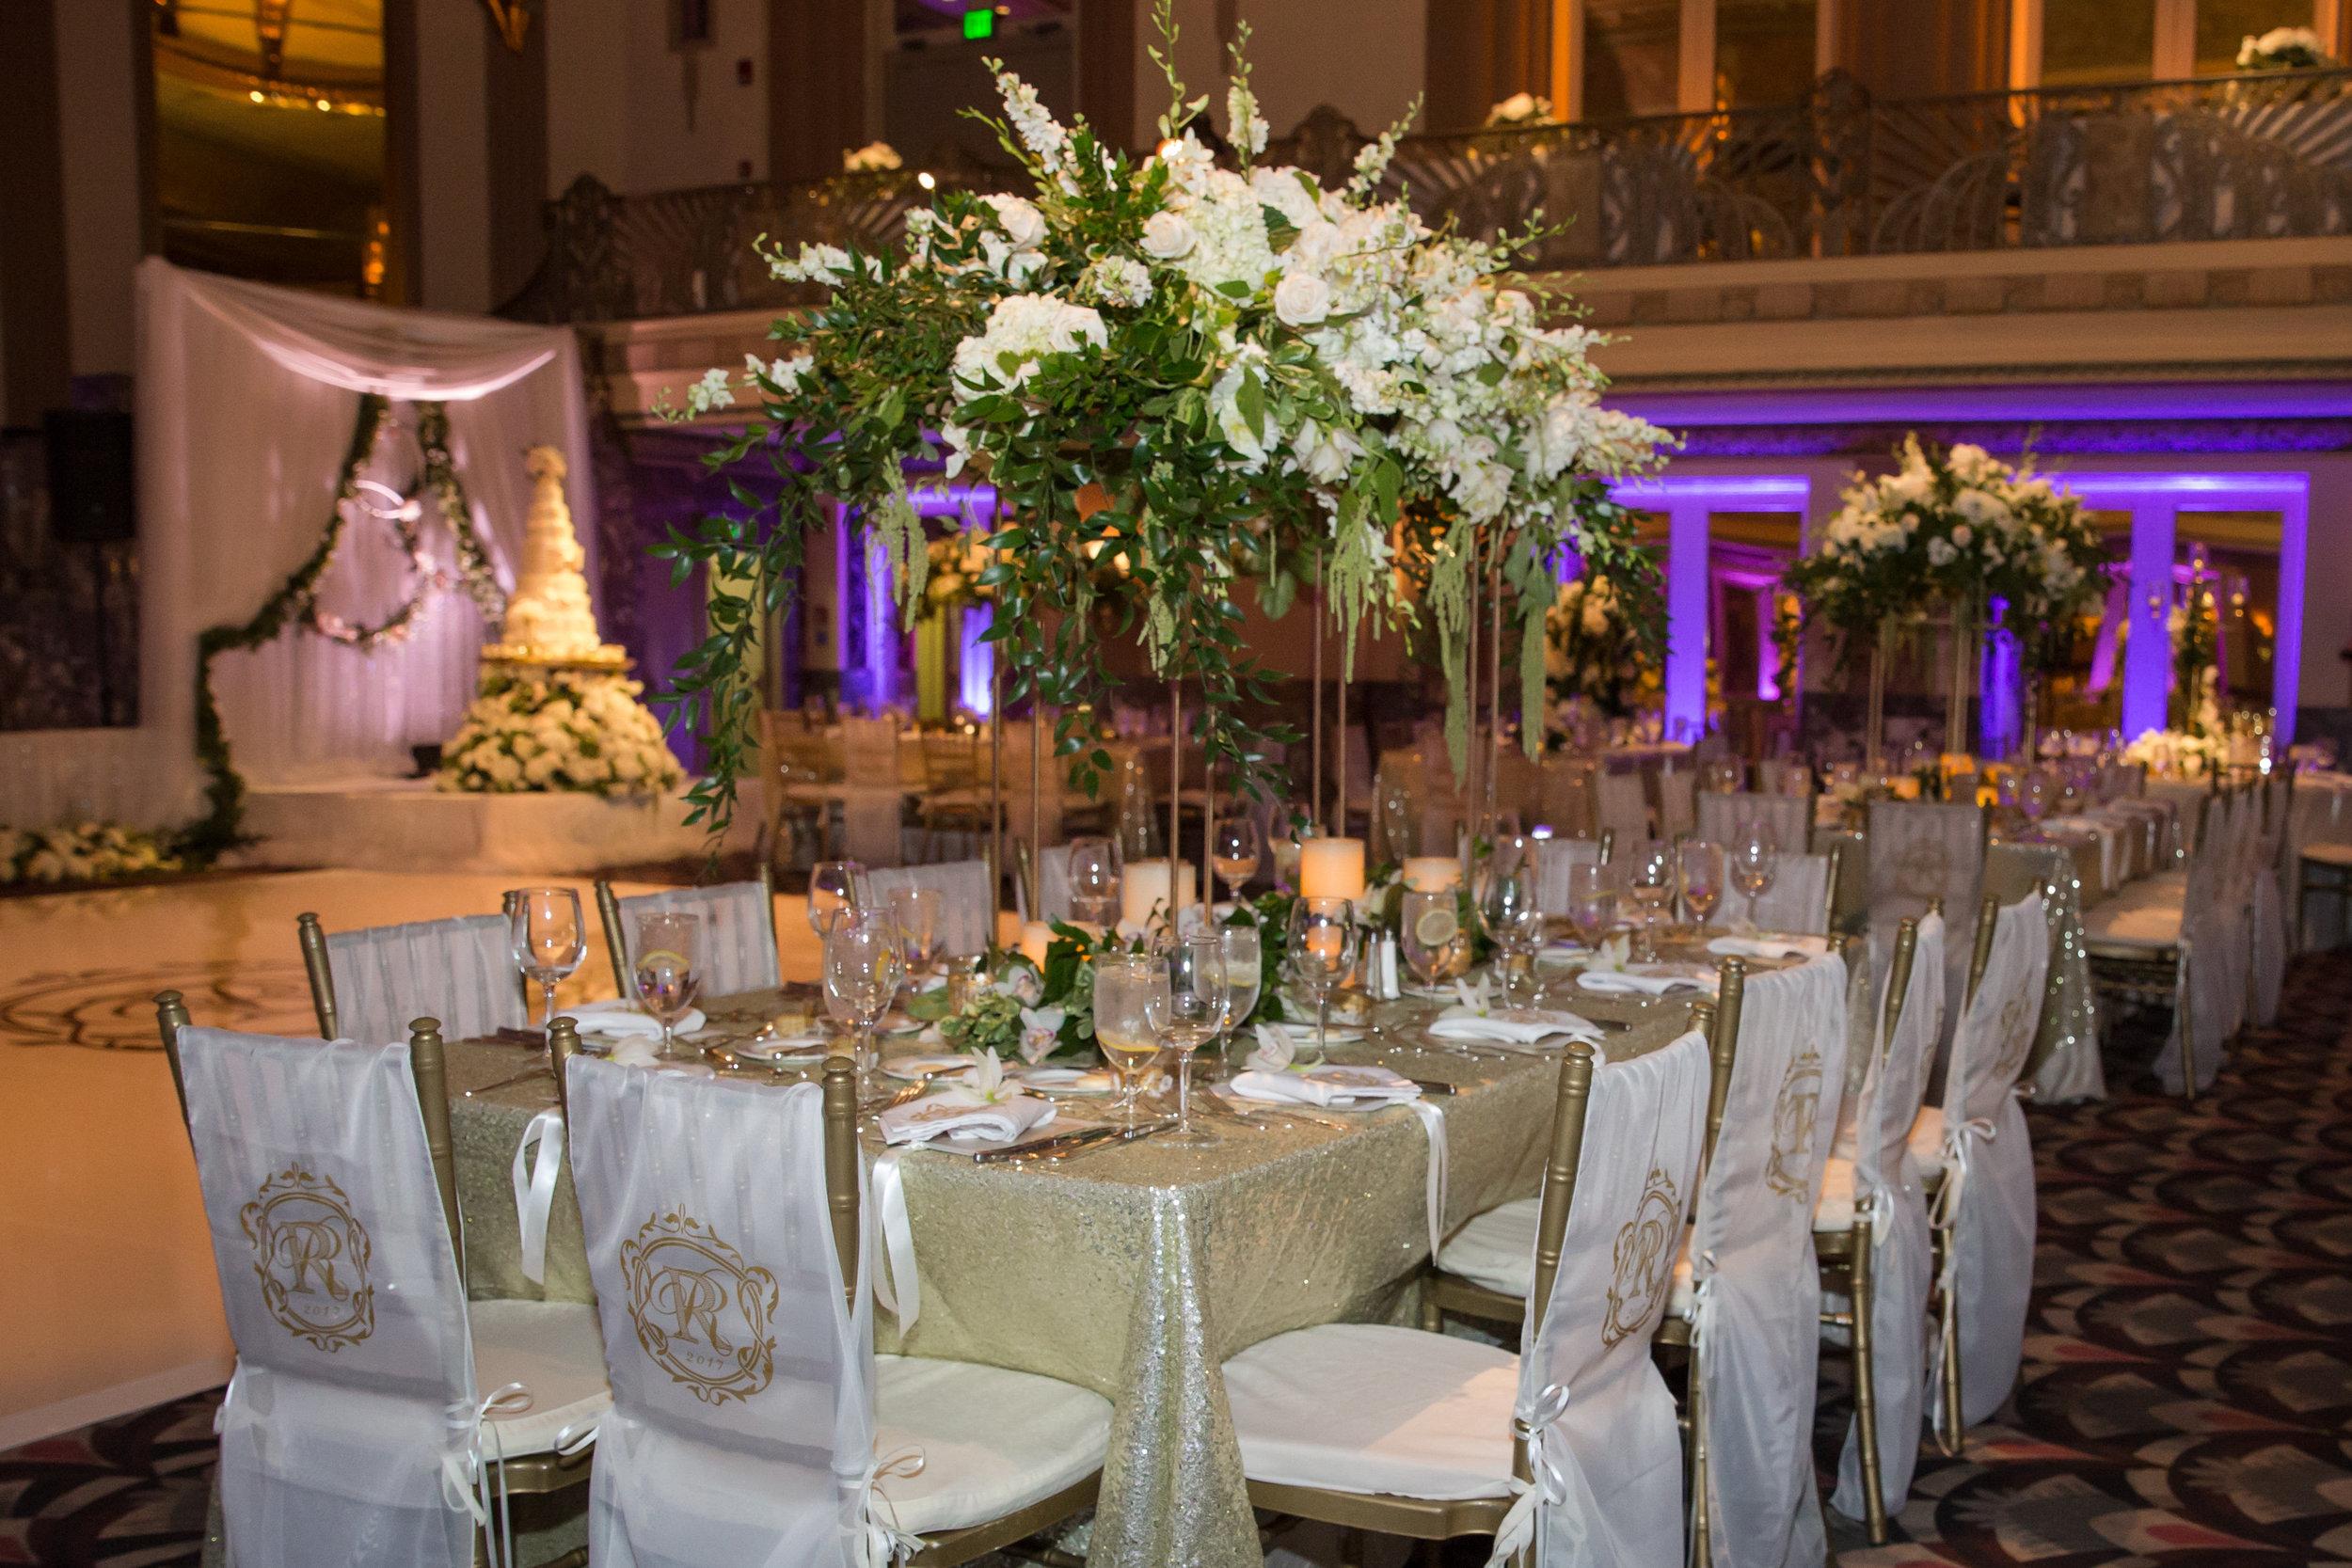 event-design-custom-silkscreen-napkins-menus-chairbacks-reception-elegant.jpg